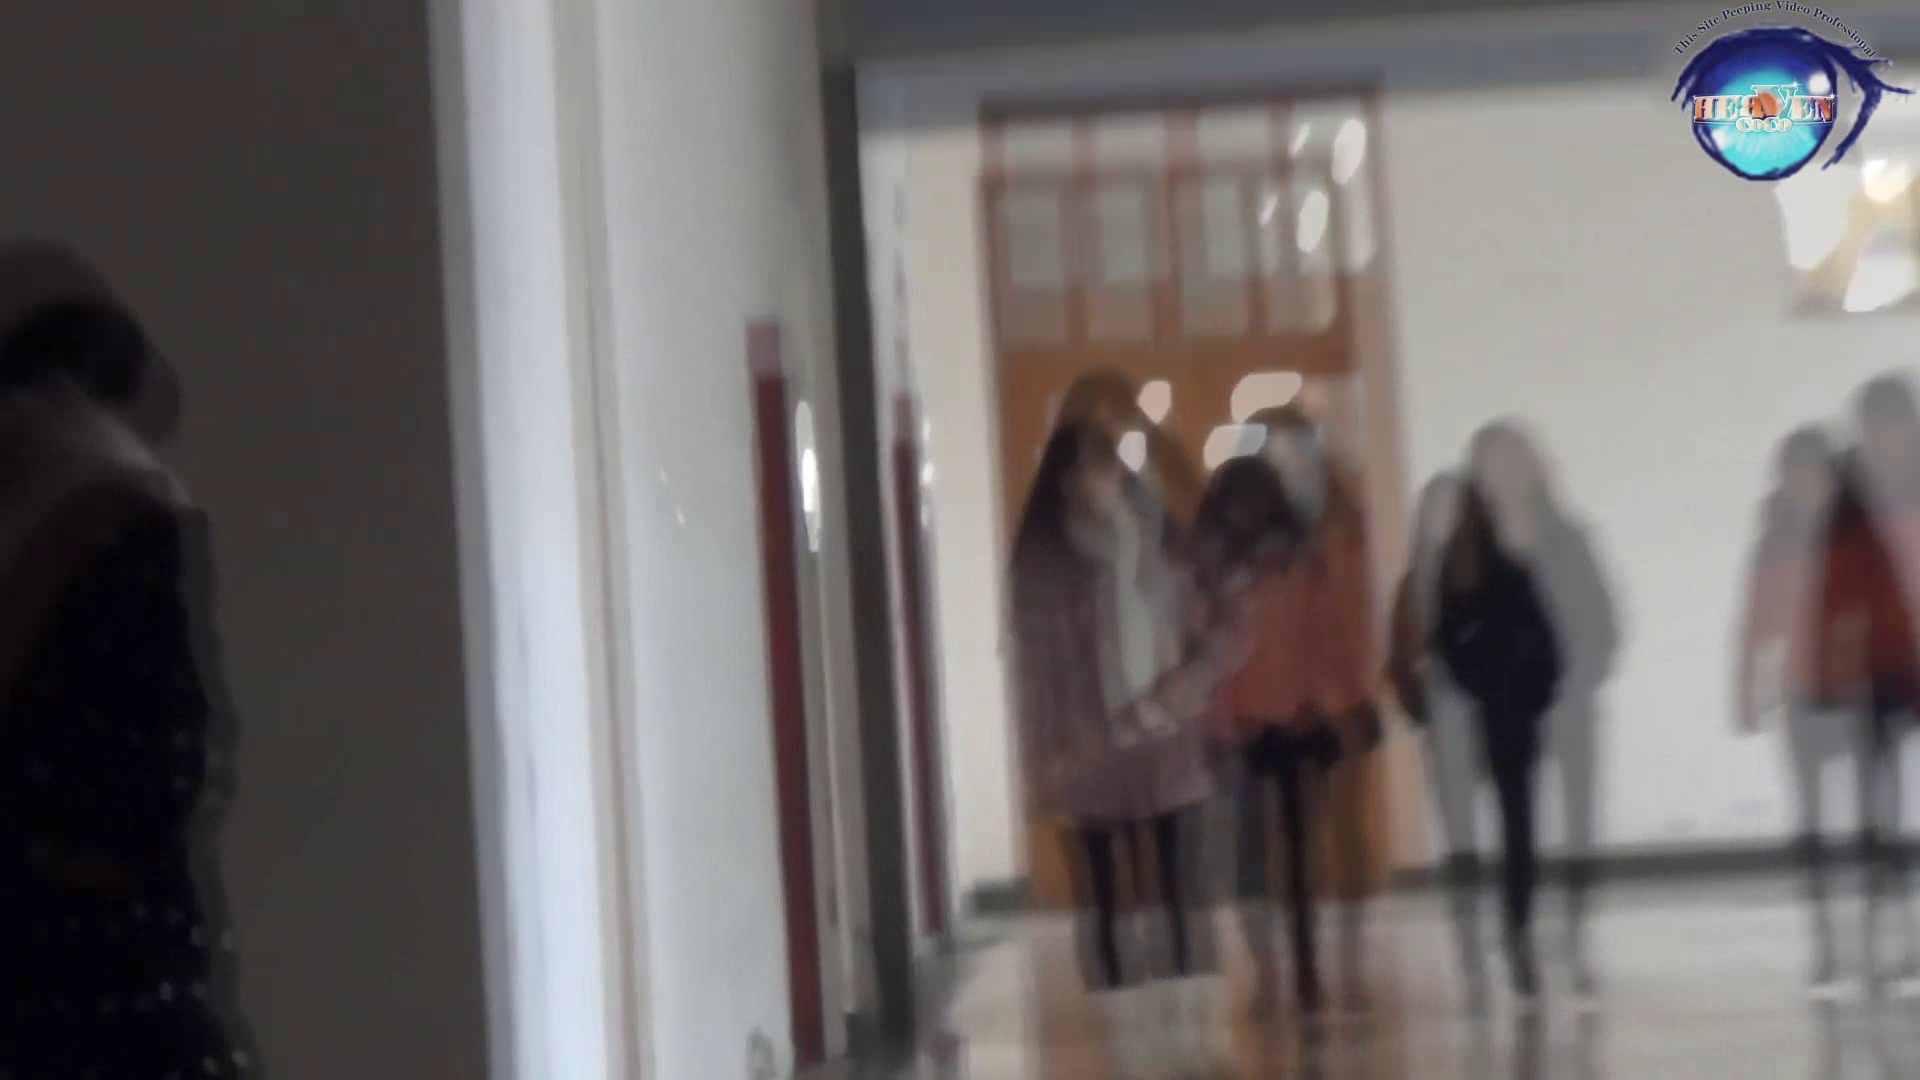 GOD HAND 芸術大学盗撮‼vol.57 盗撮師作品 オメコ動画キャプチャ 92pic 18